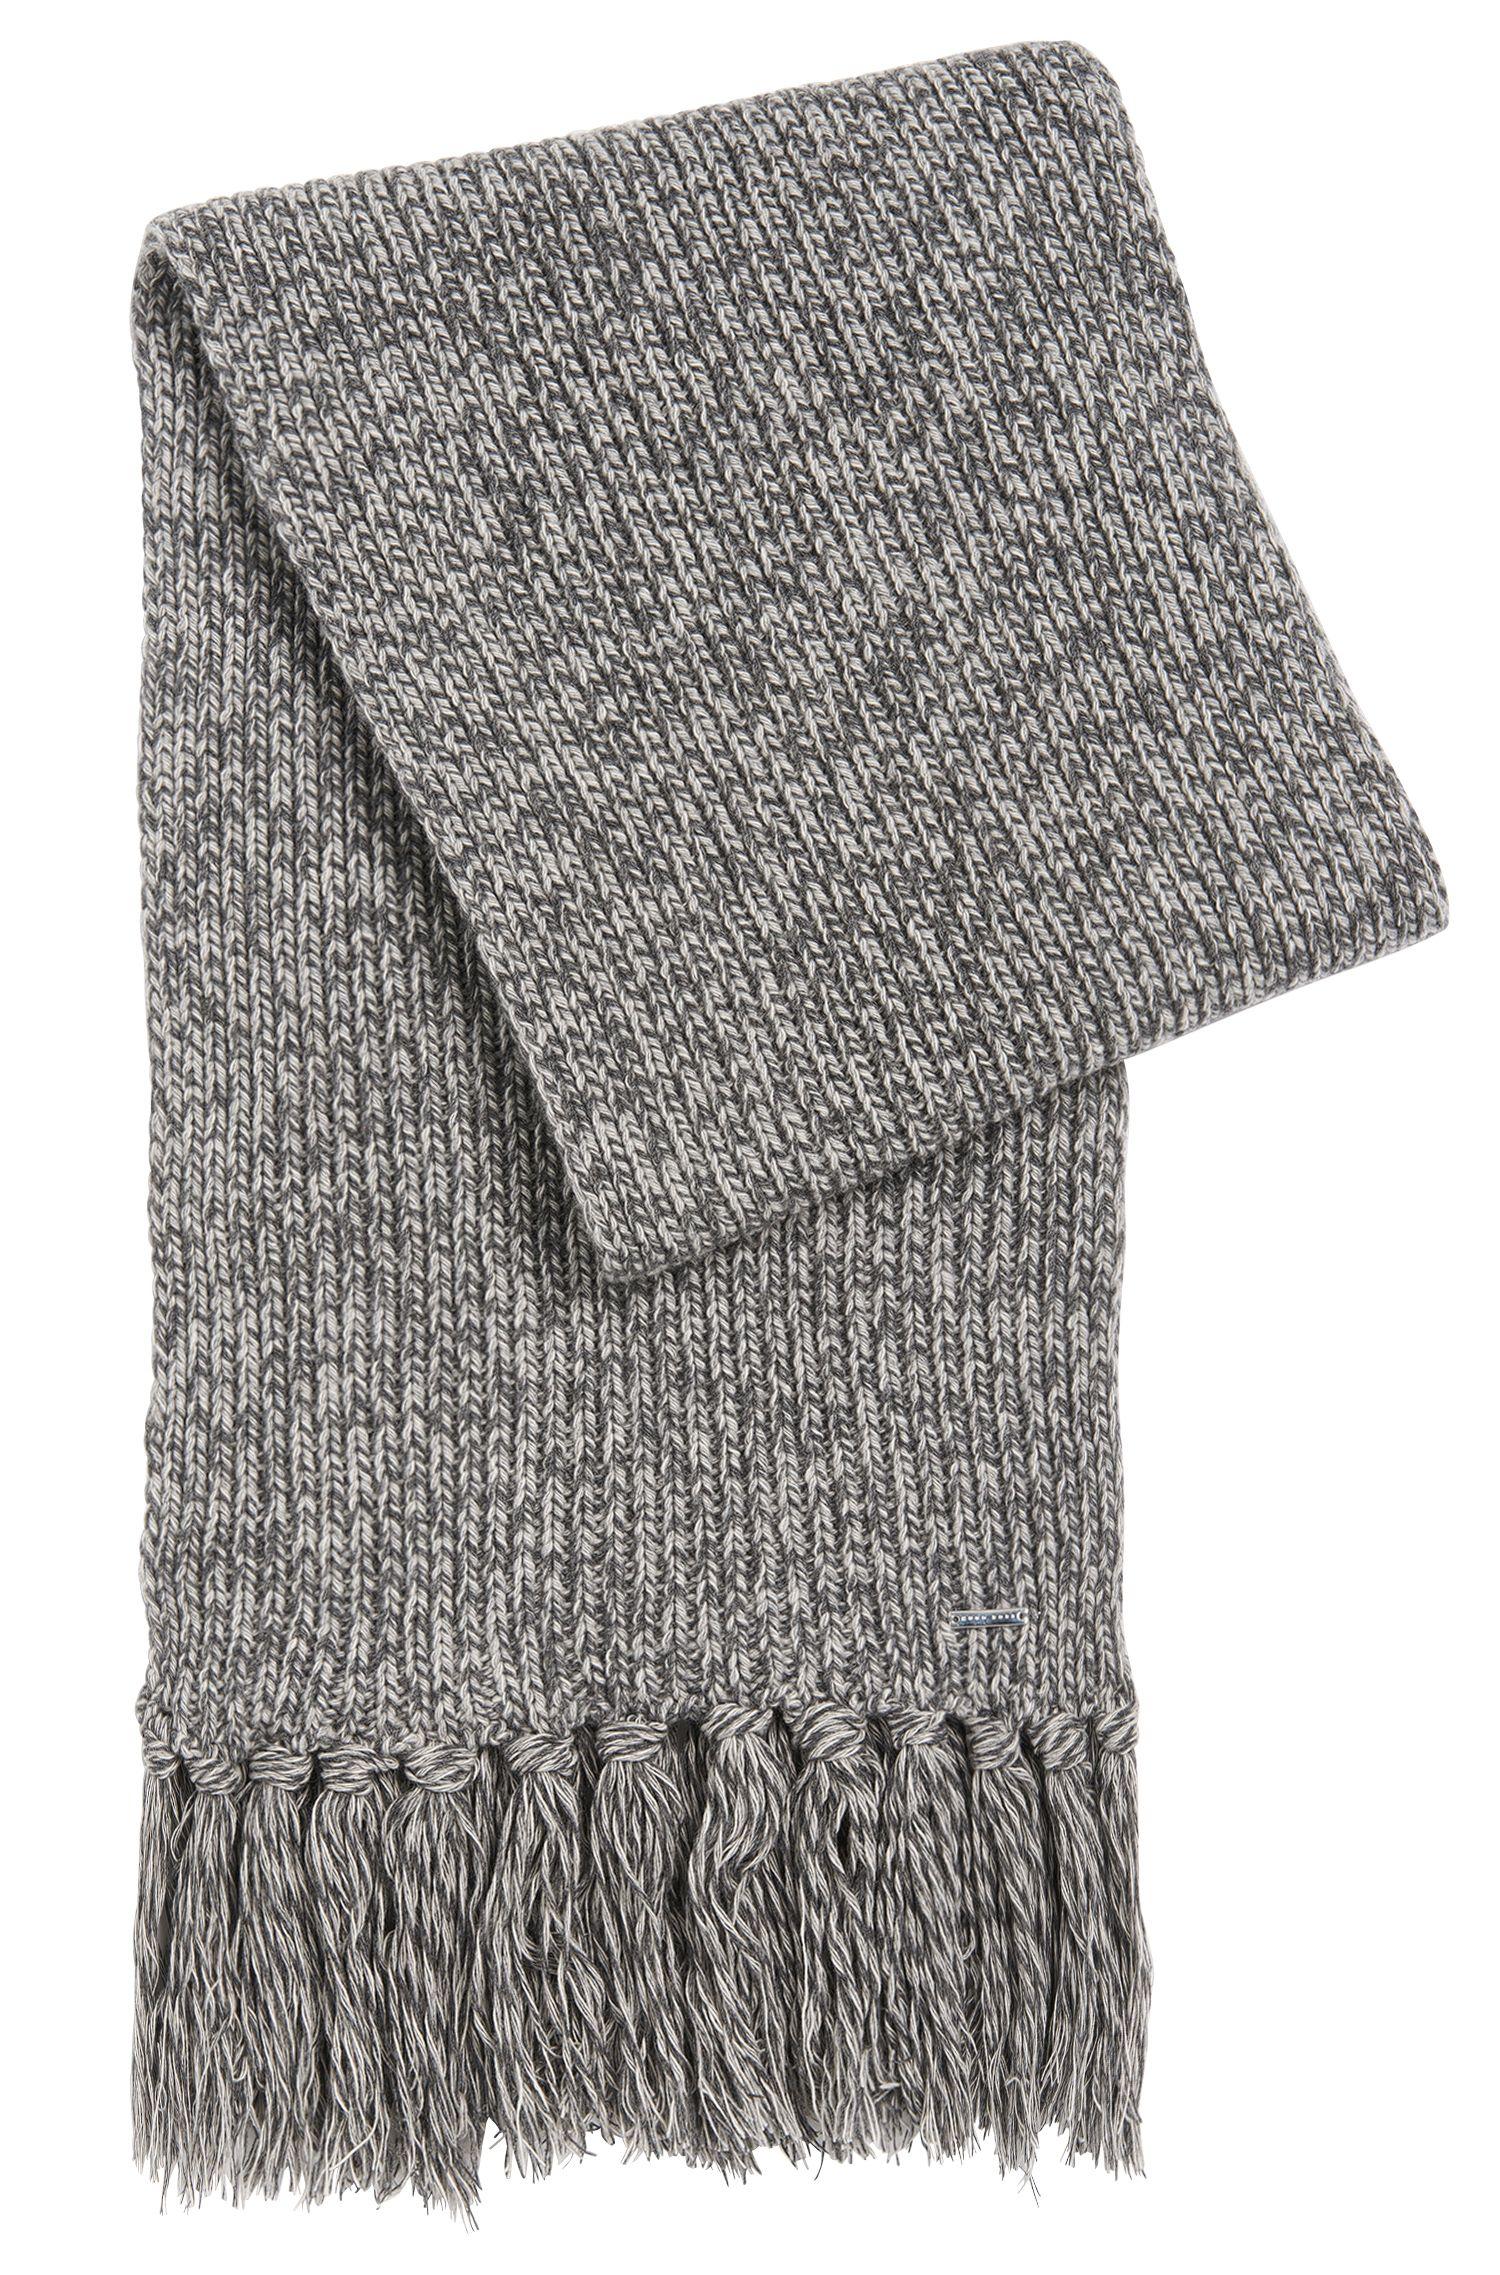 'T-Bassetto' | Italian Cashmere Wool Scarf